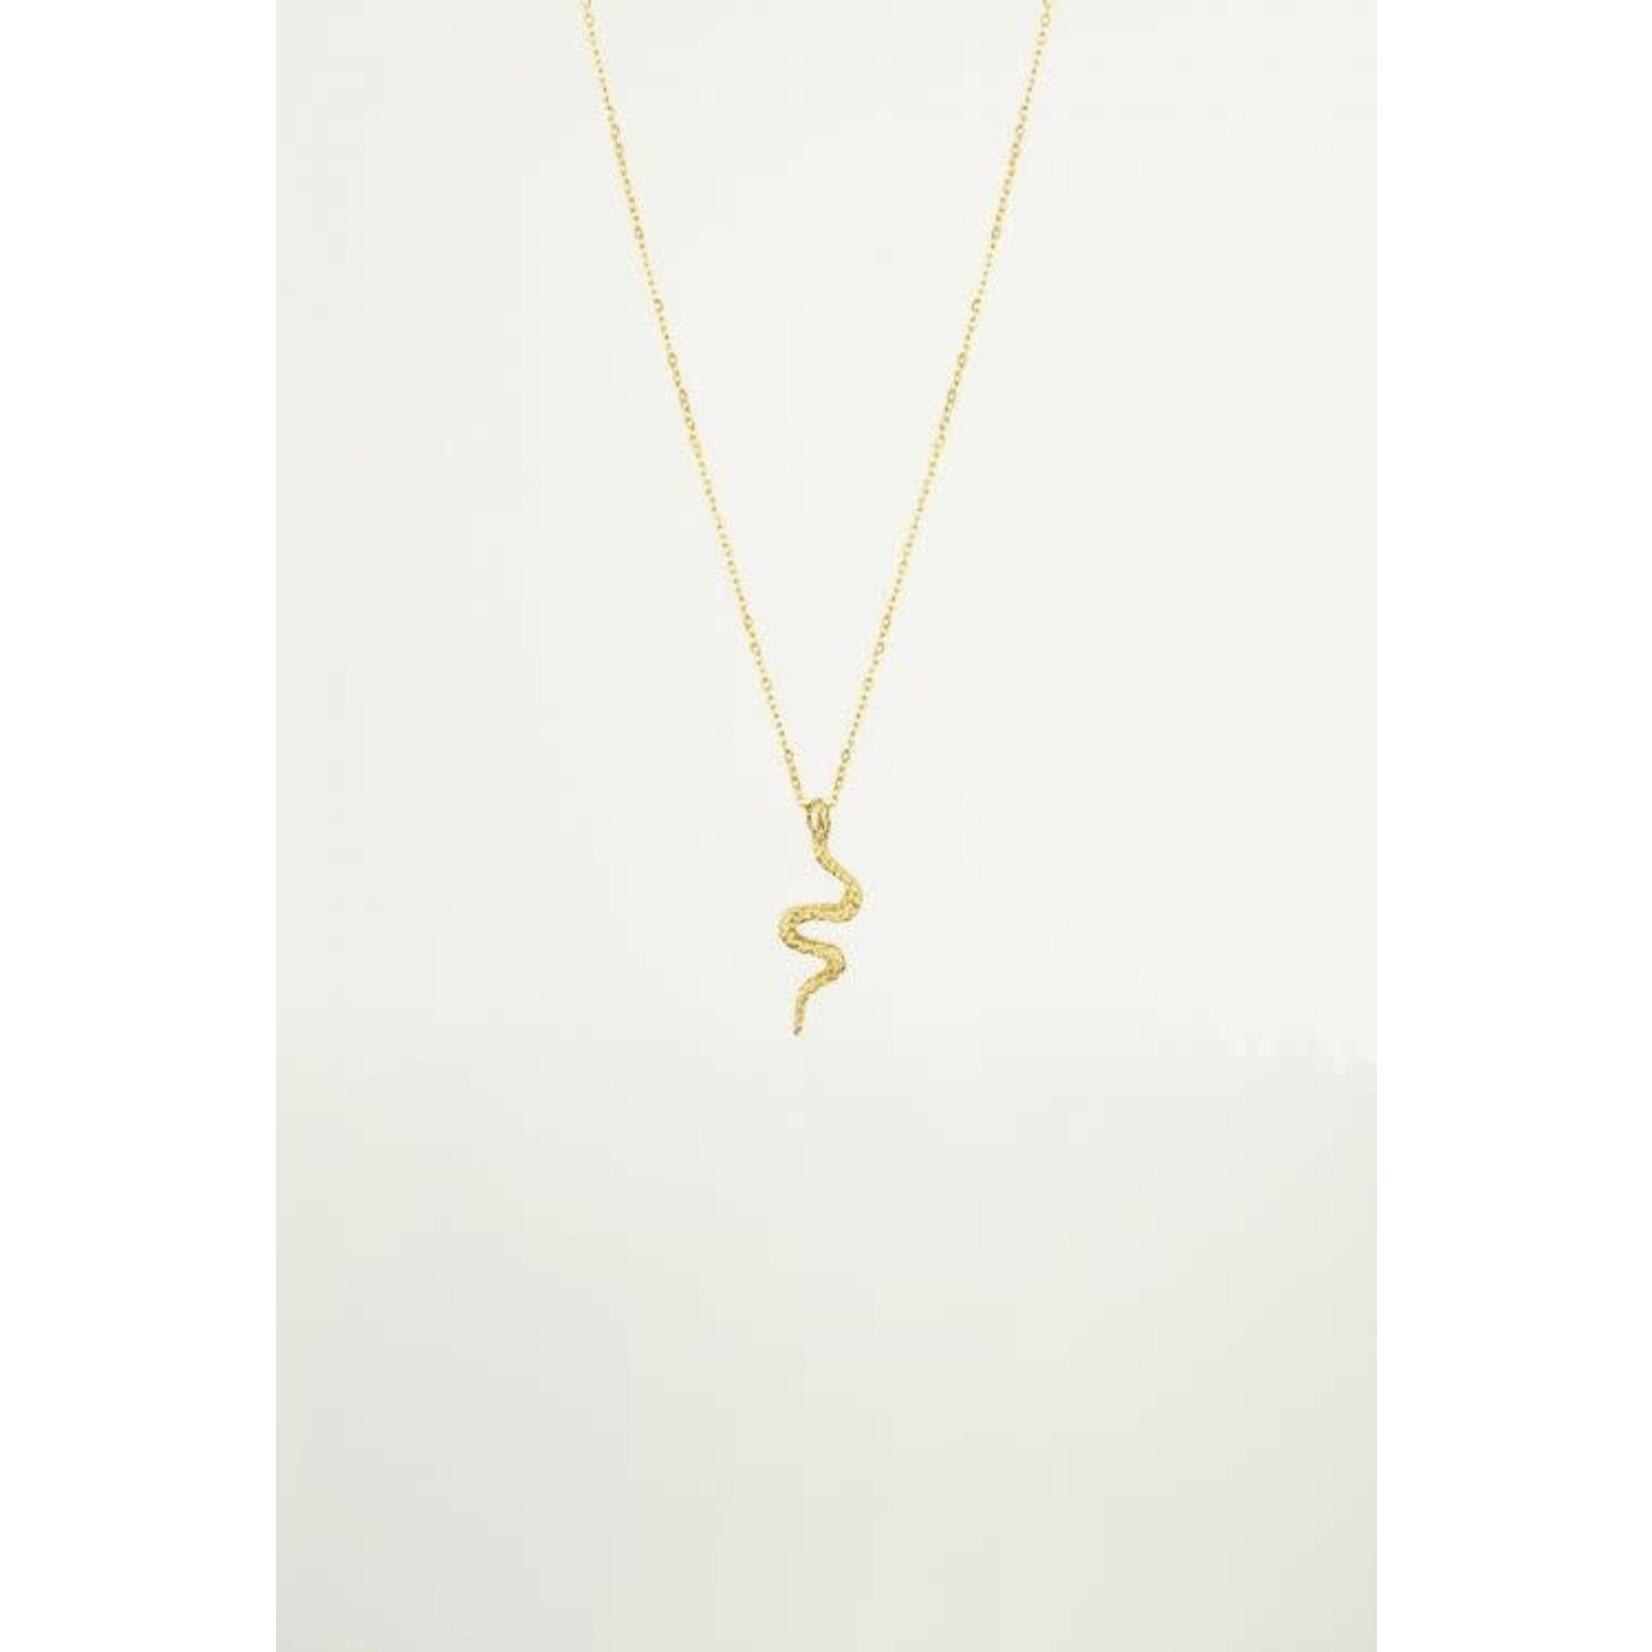 MY JEWELLERY Ketting hanger slang goud